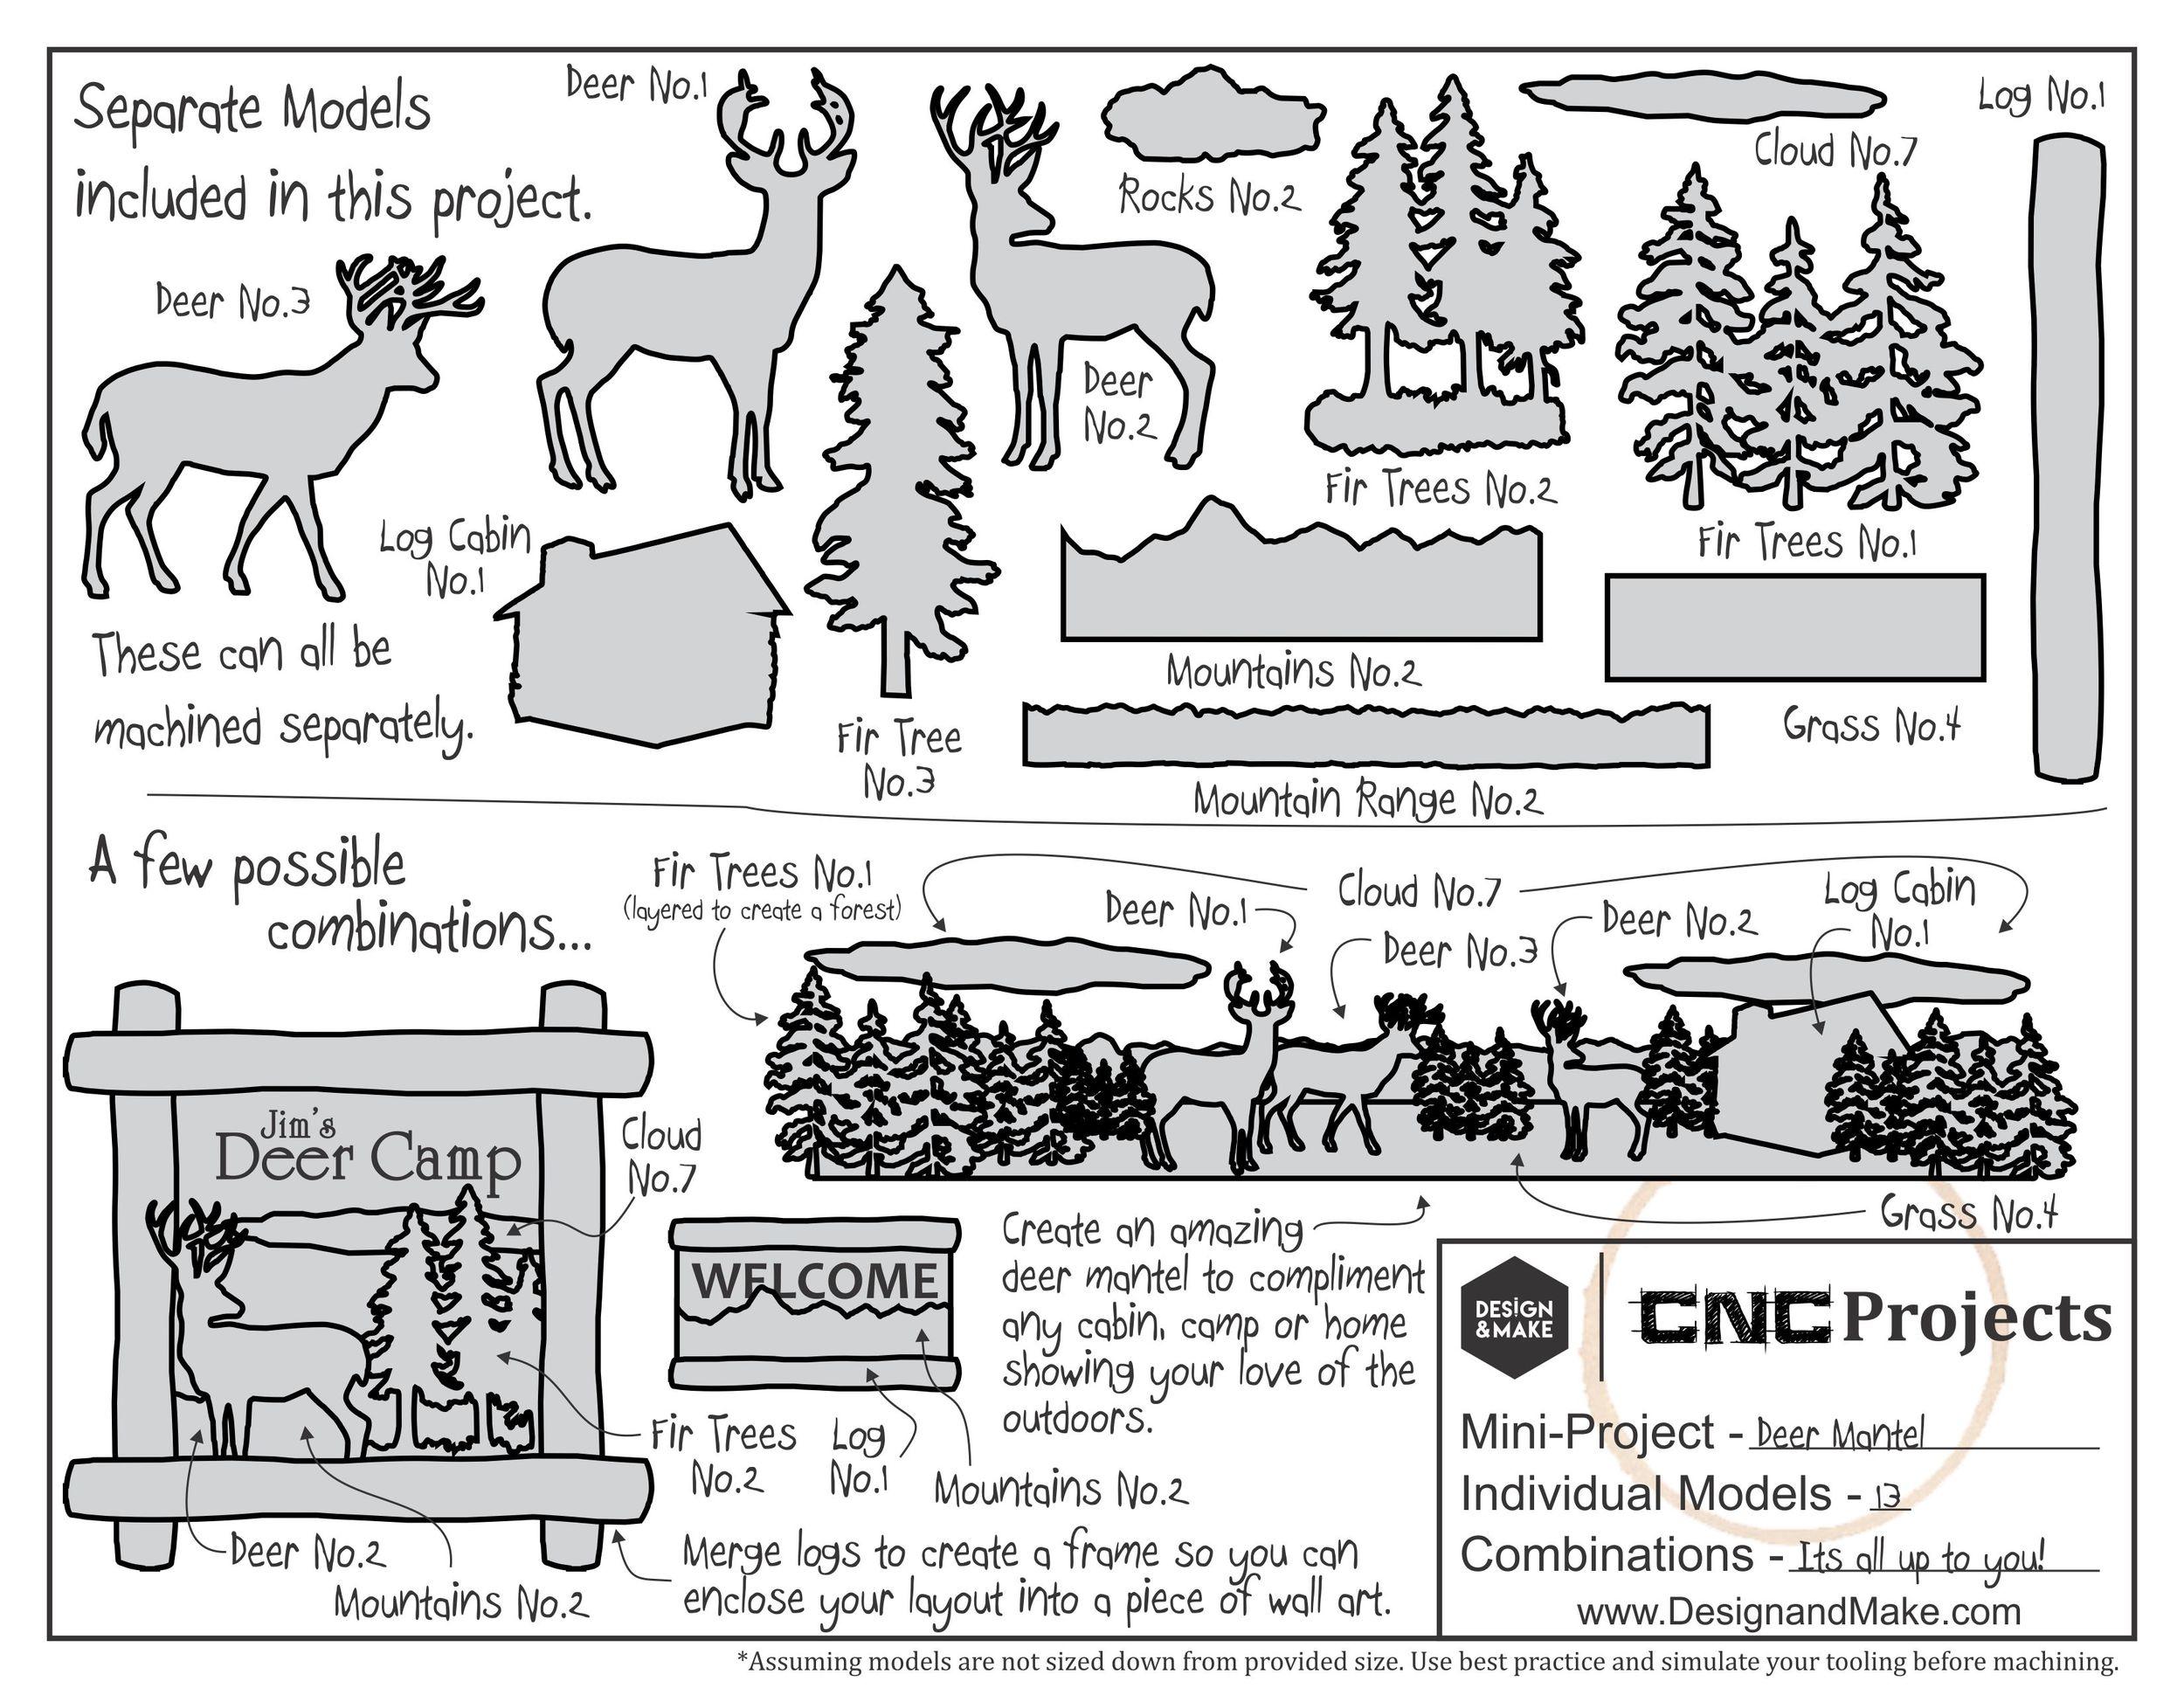 Project Sheet - Deer Mantel.jpg